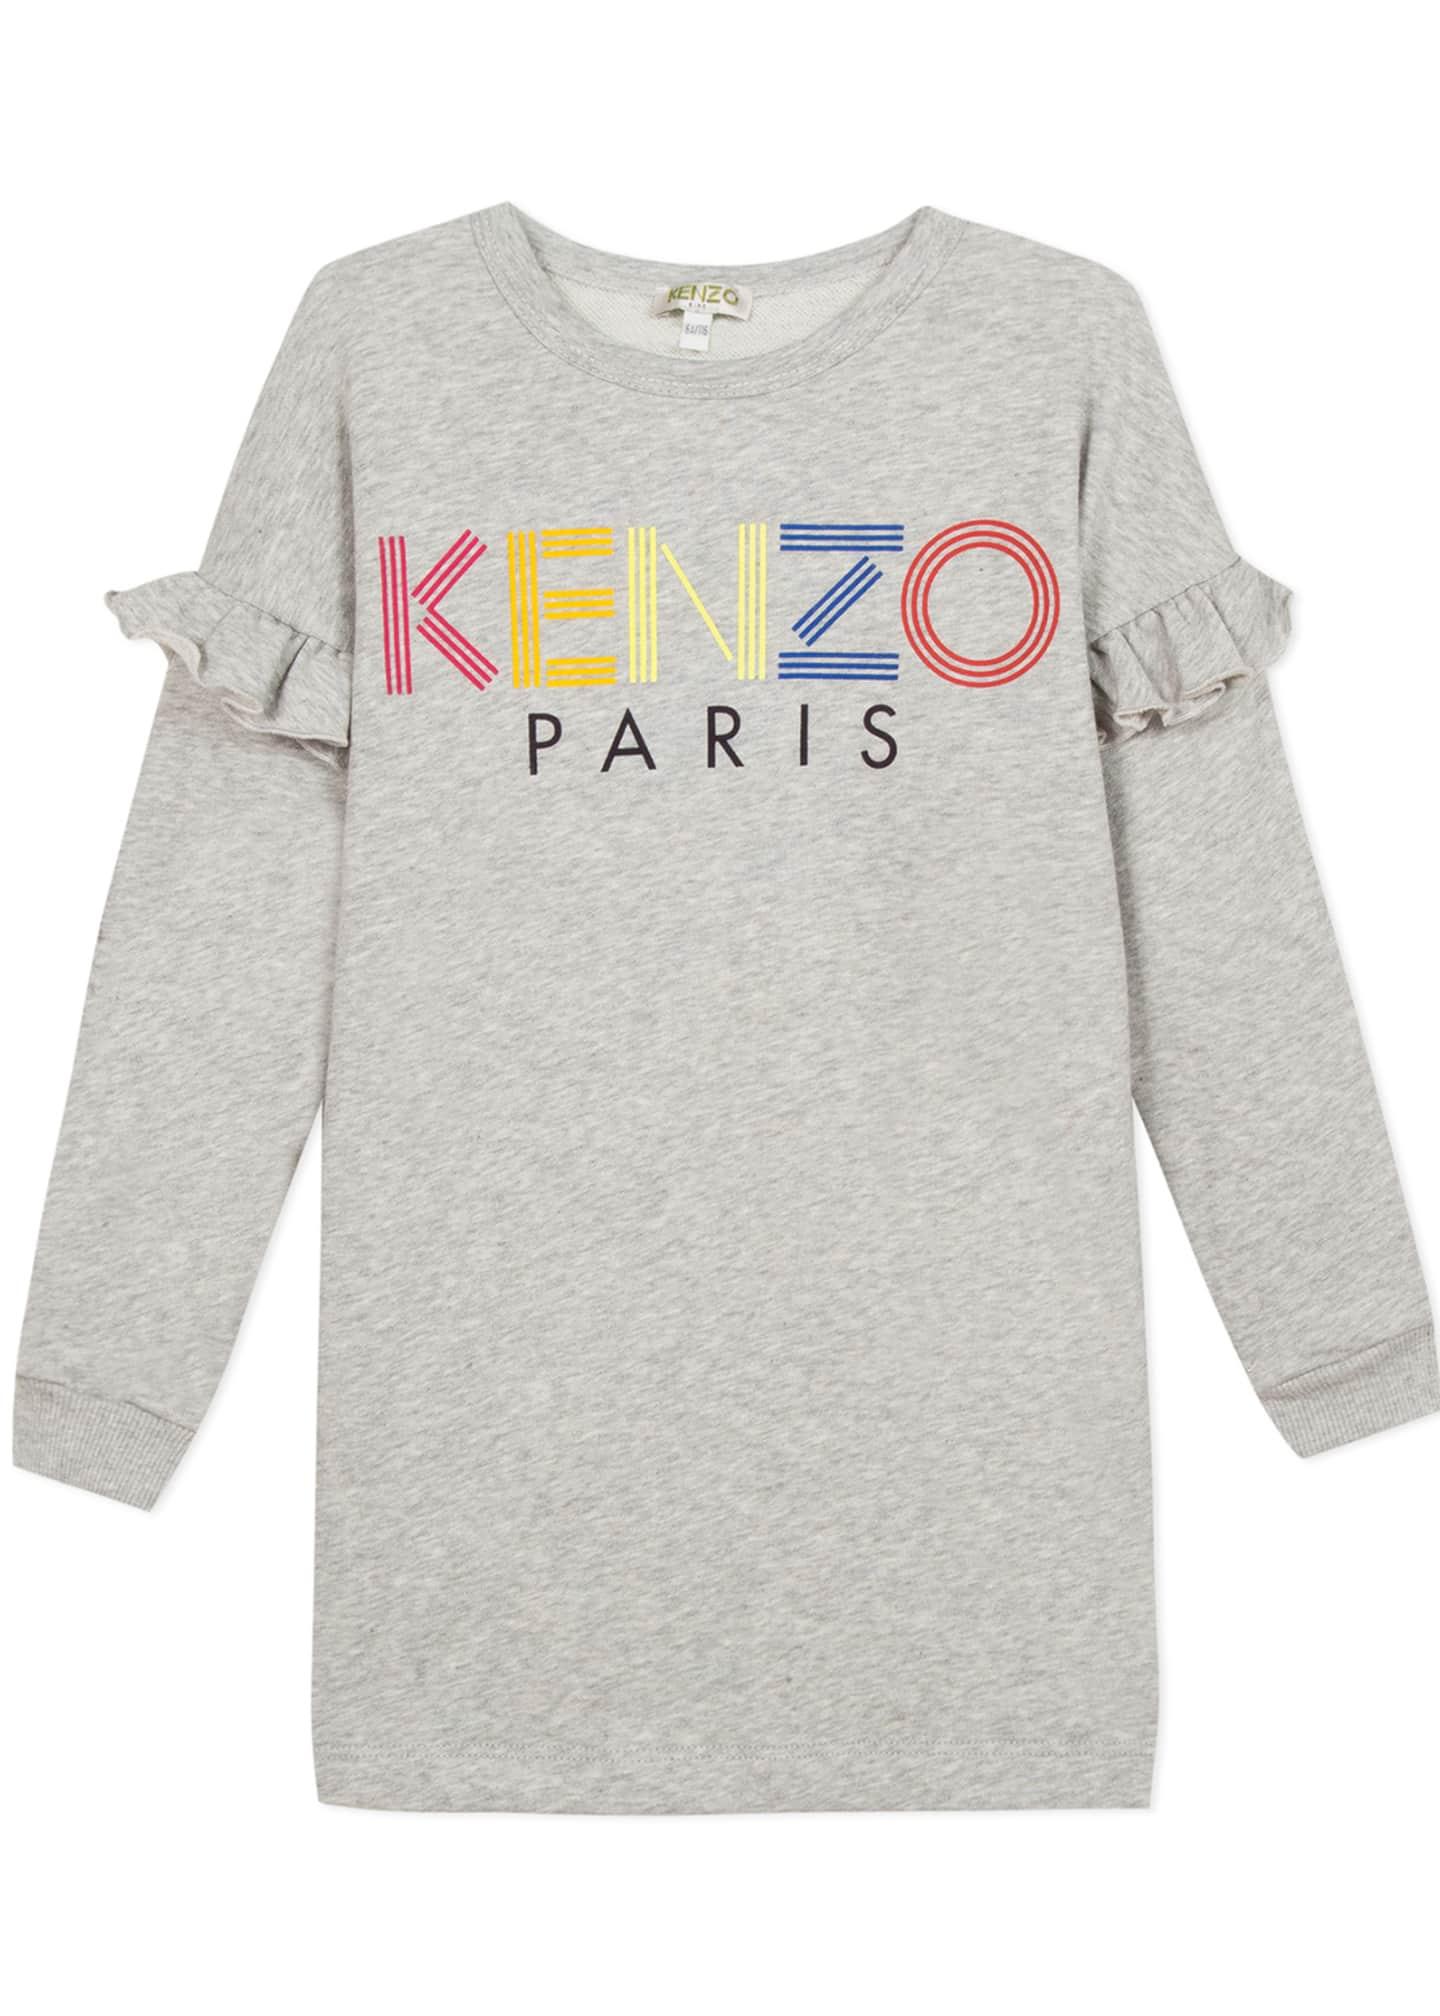 Kenzo Ruffle-Trim Logo Dress, Size 2-6